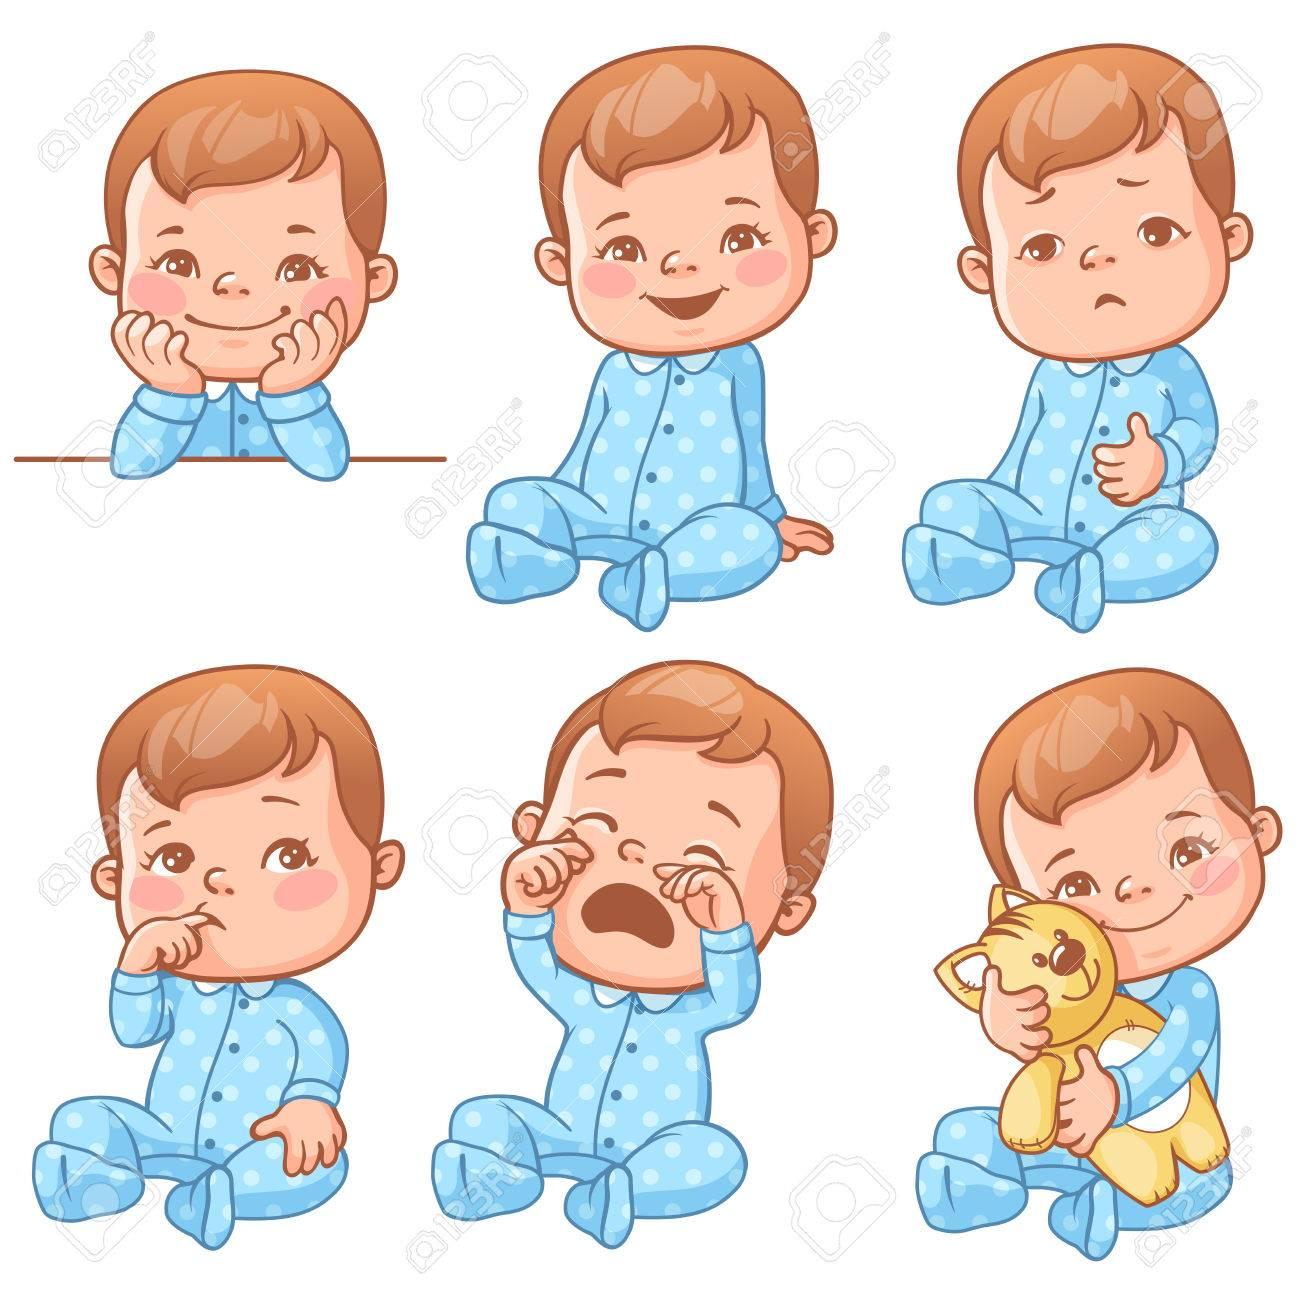 baby boy emotions set - 71091964